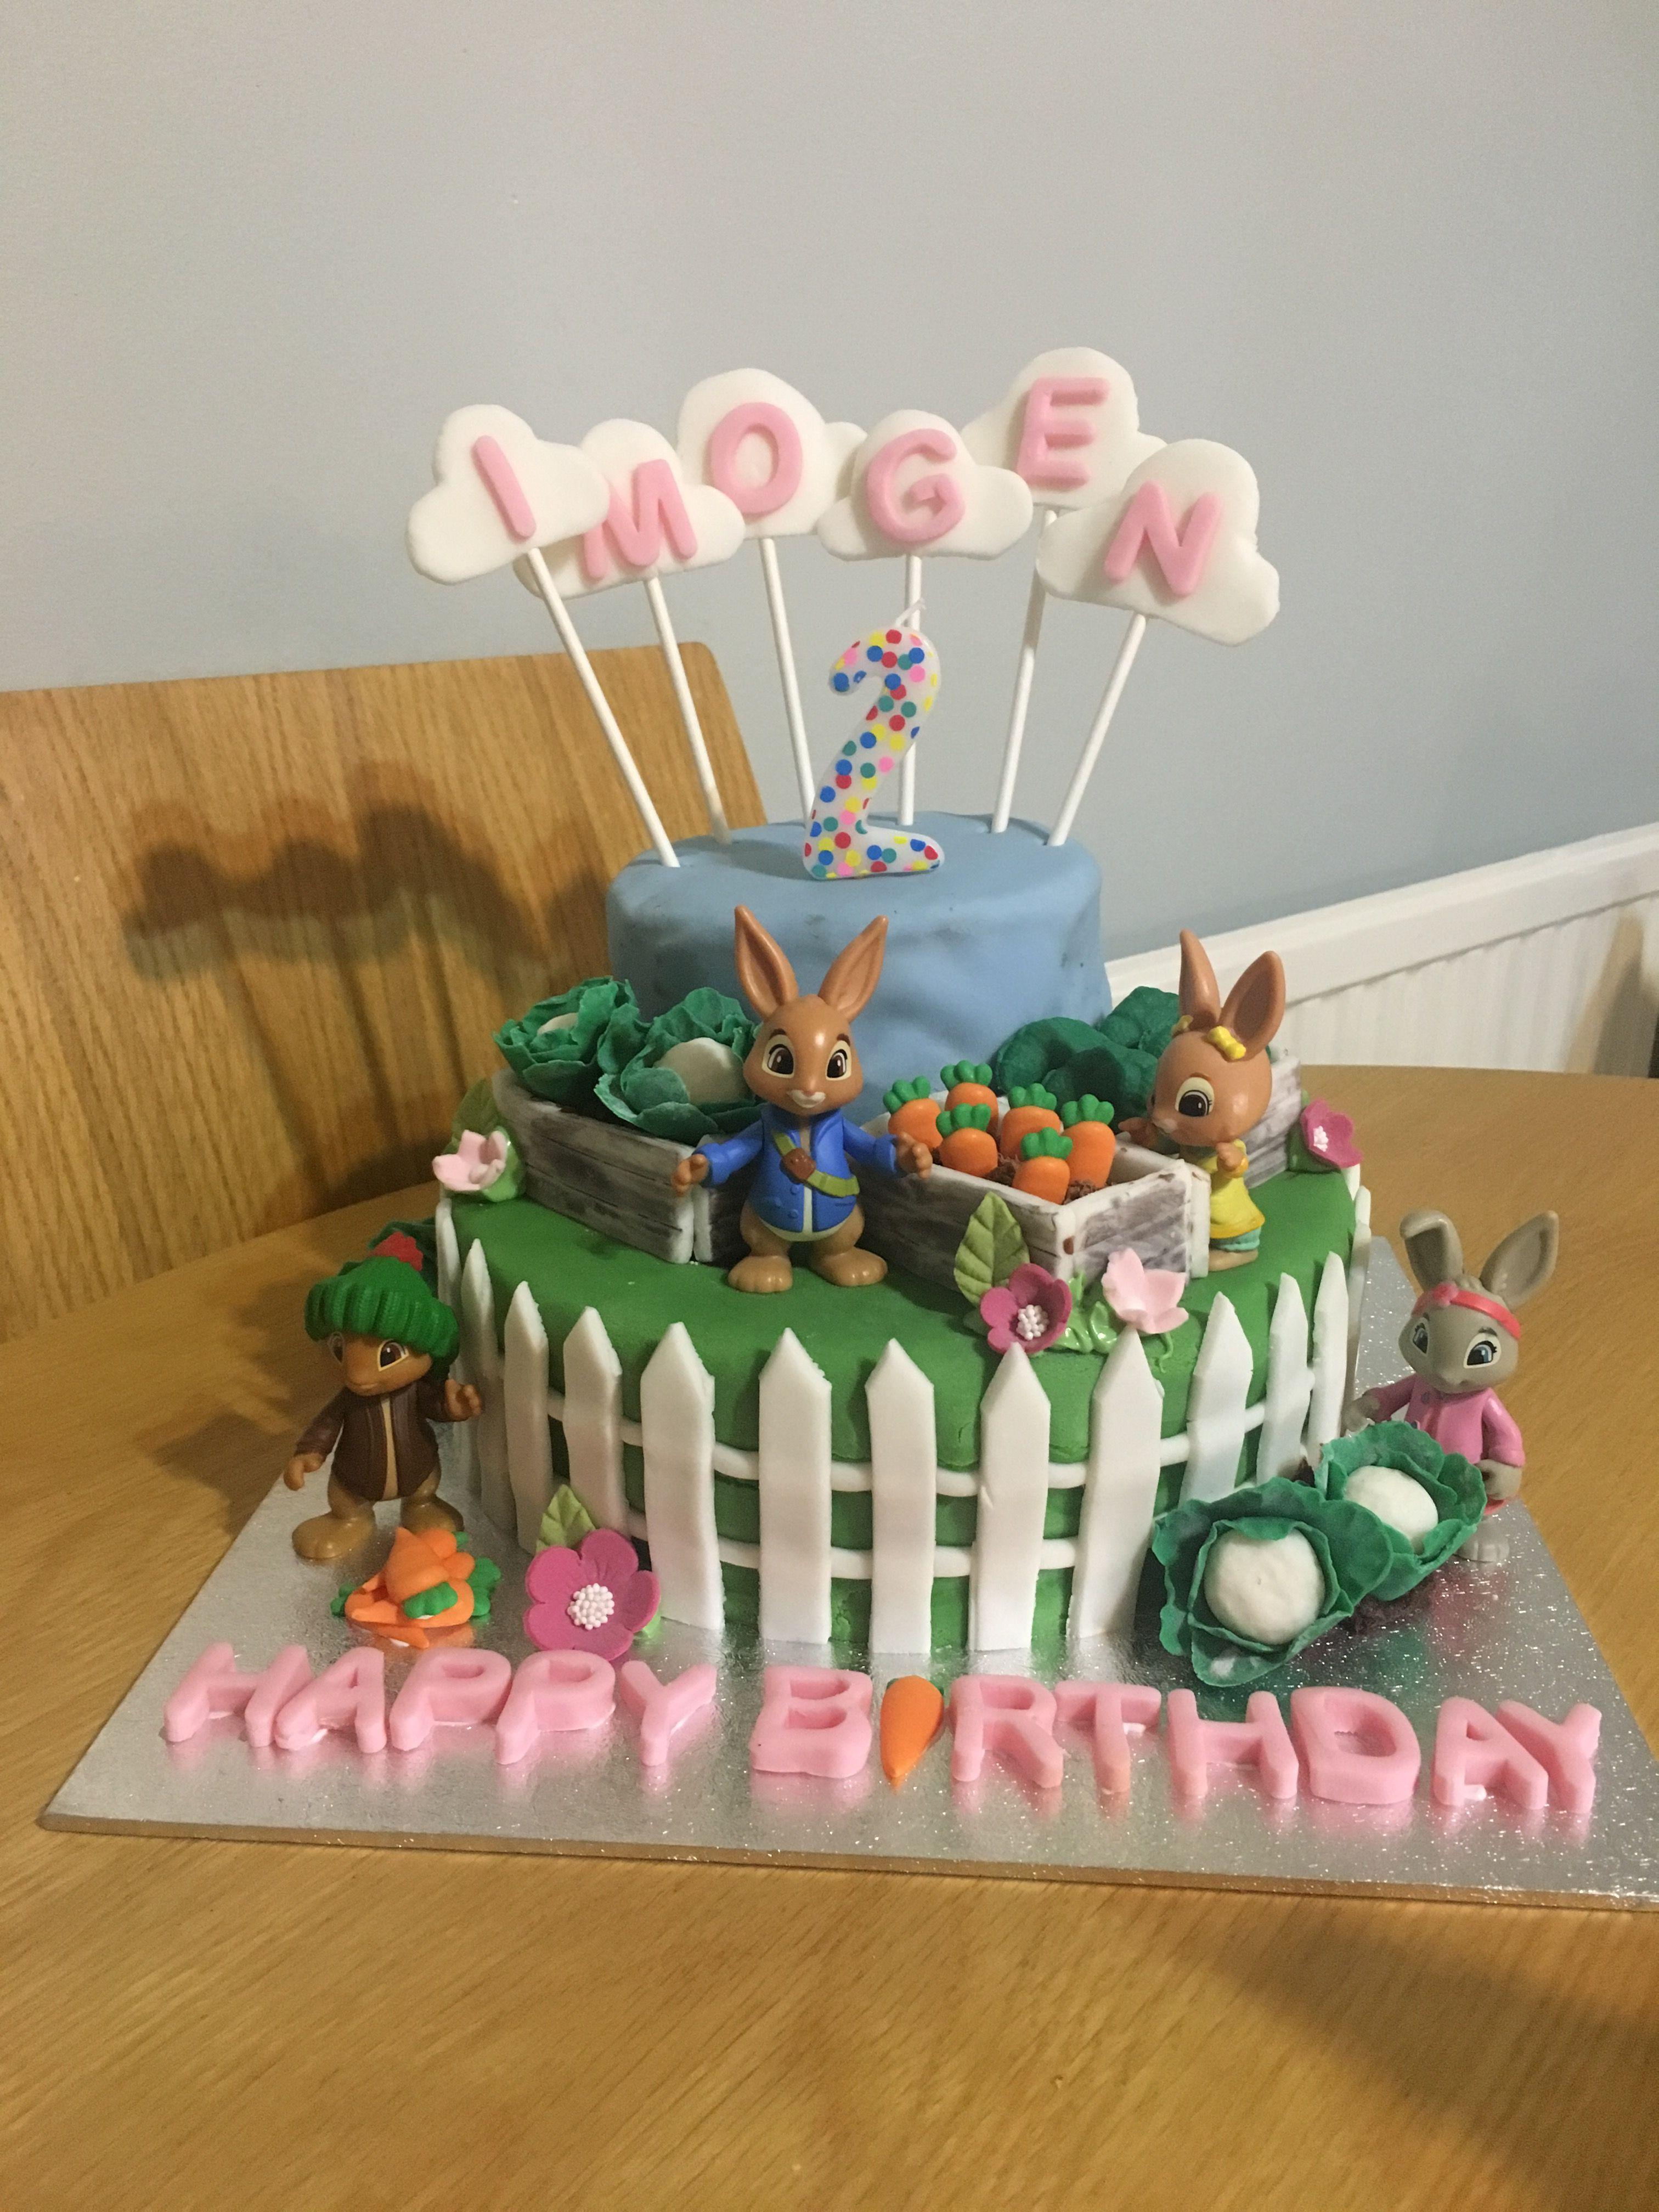 Home Made Peter Rabbit Birthday Cake 3rd Birthday Cakes Peter